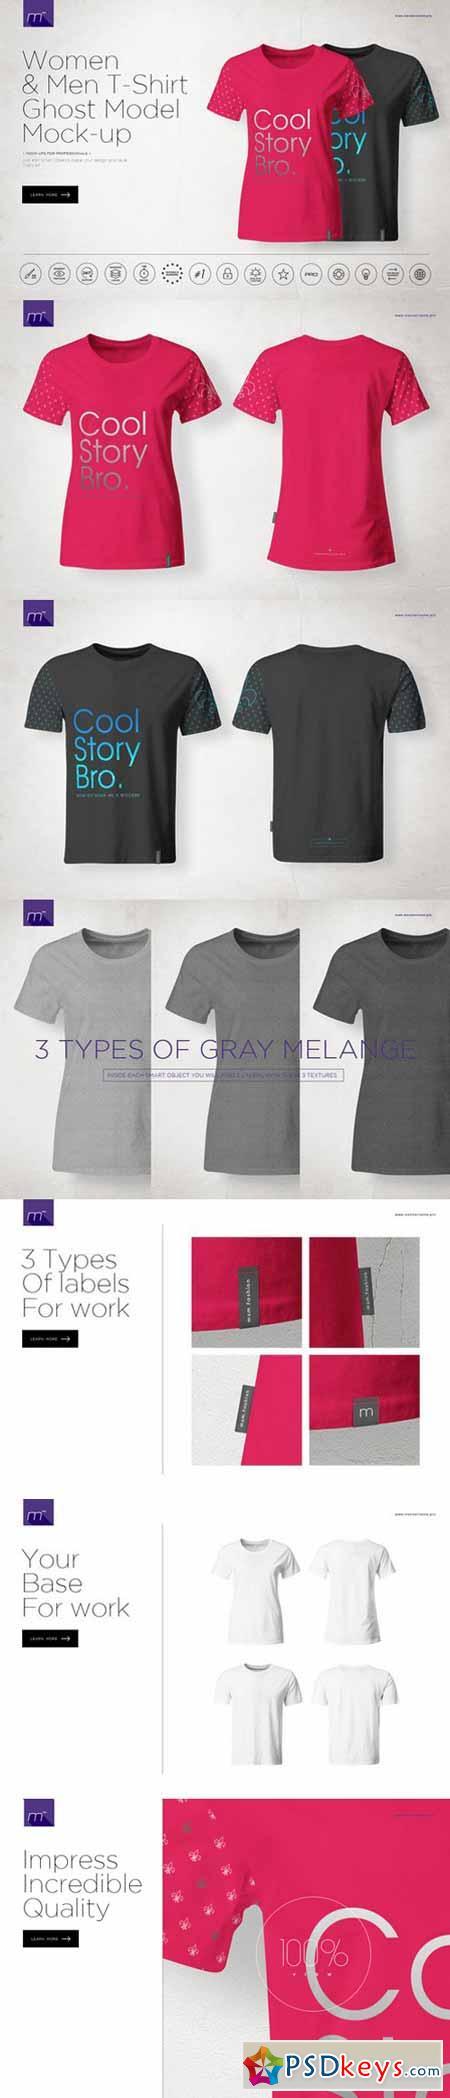 Men & Women Ghost T-shirt Mock-up 541278